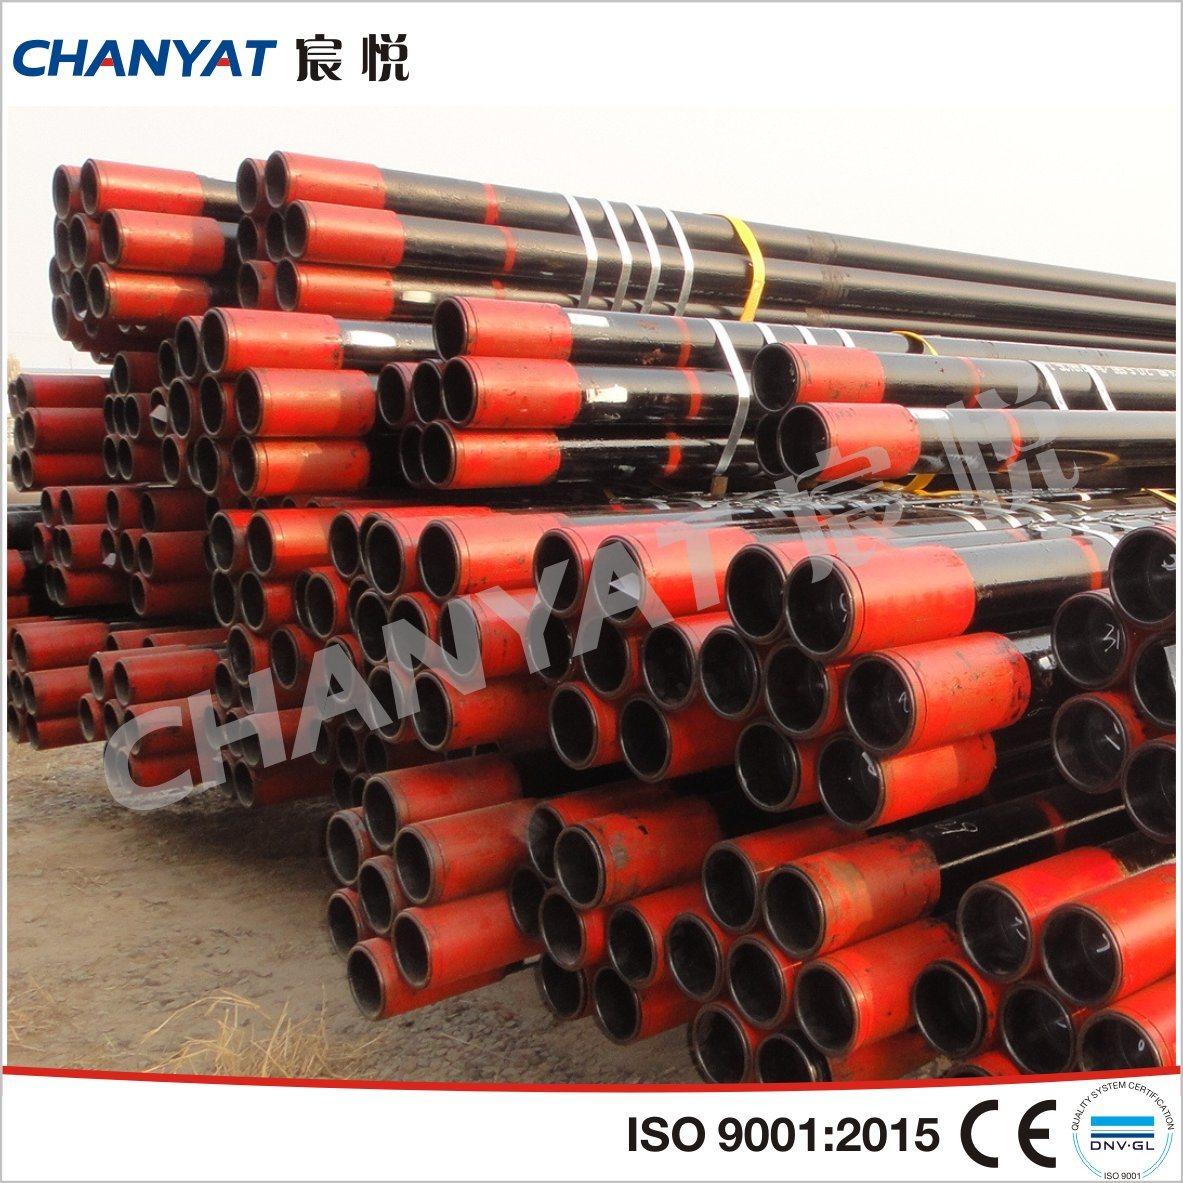 API 5L Line Steel Seamless Pipe & Tubing (X56, X60, X65)